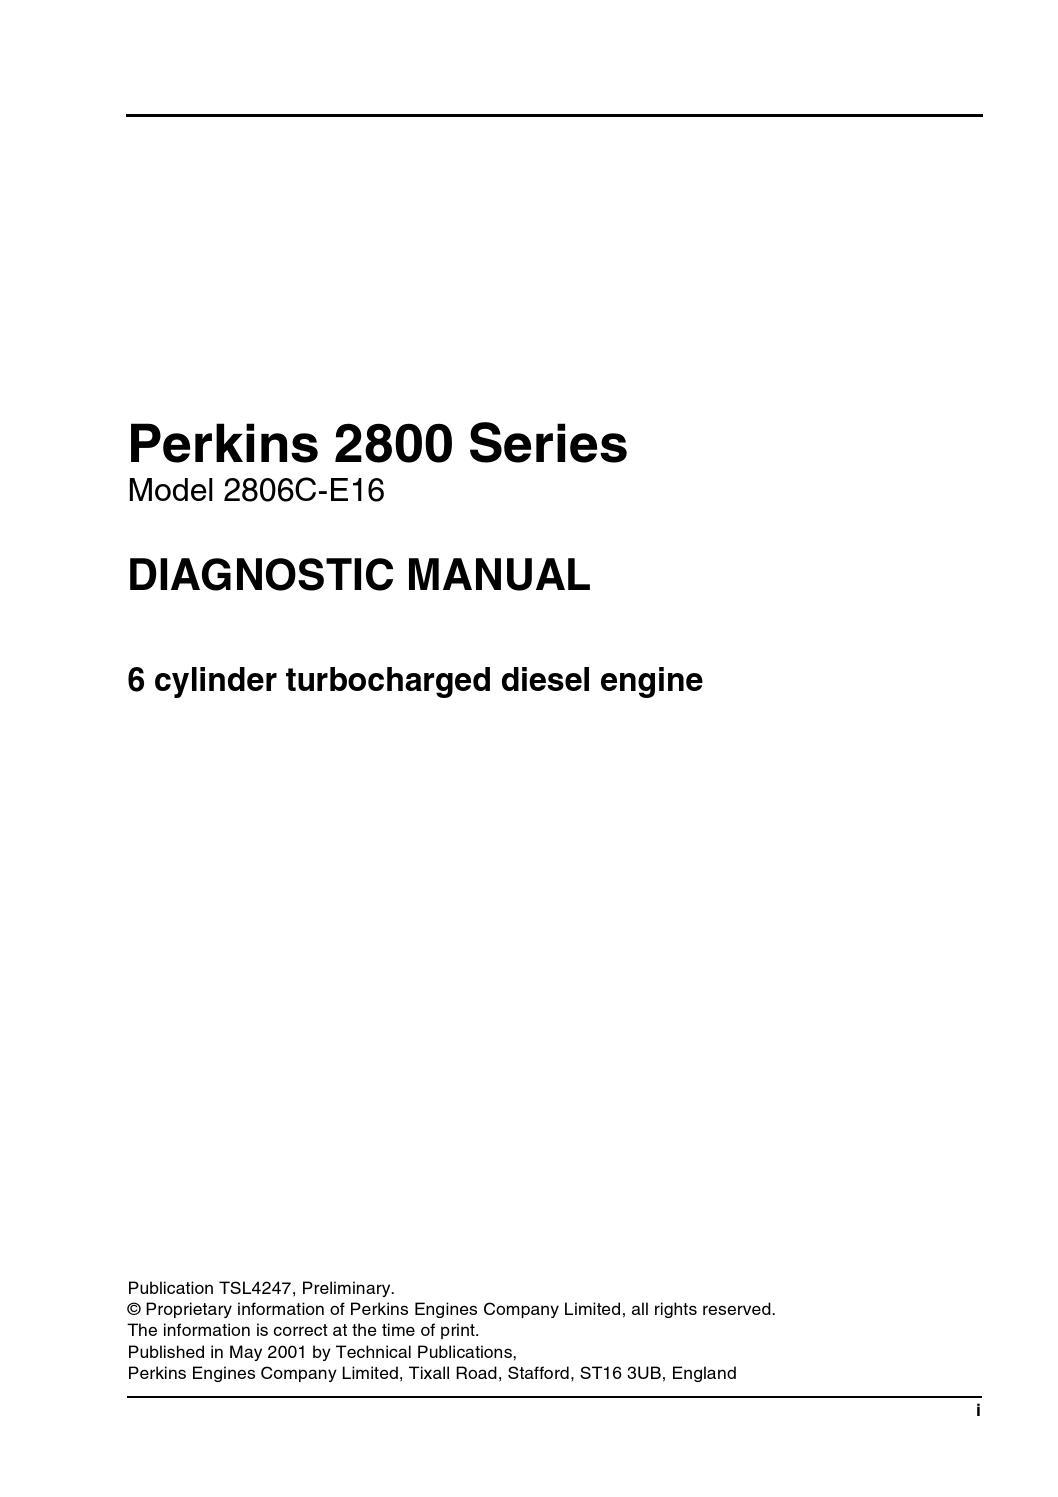 perkins 2800 series model 2806c e16 diagonstic manual by emir perkins 2800 series model 2806c e16 diagonstic manual by emir pjanic issuu